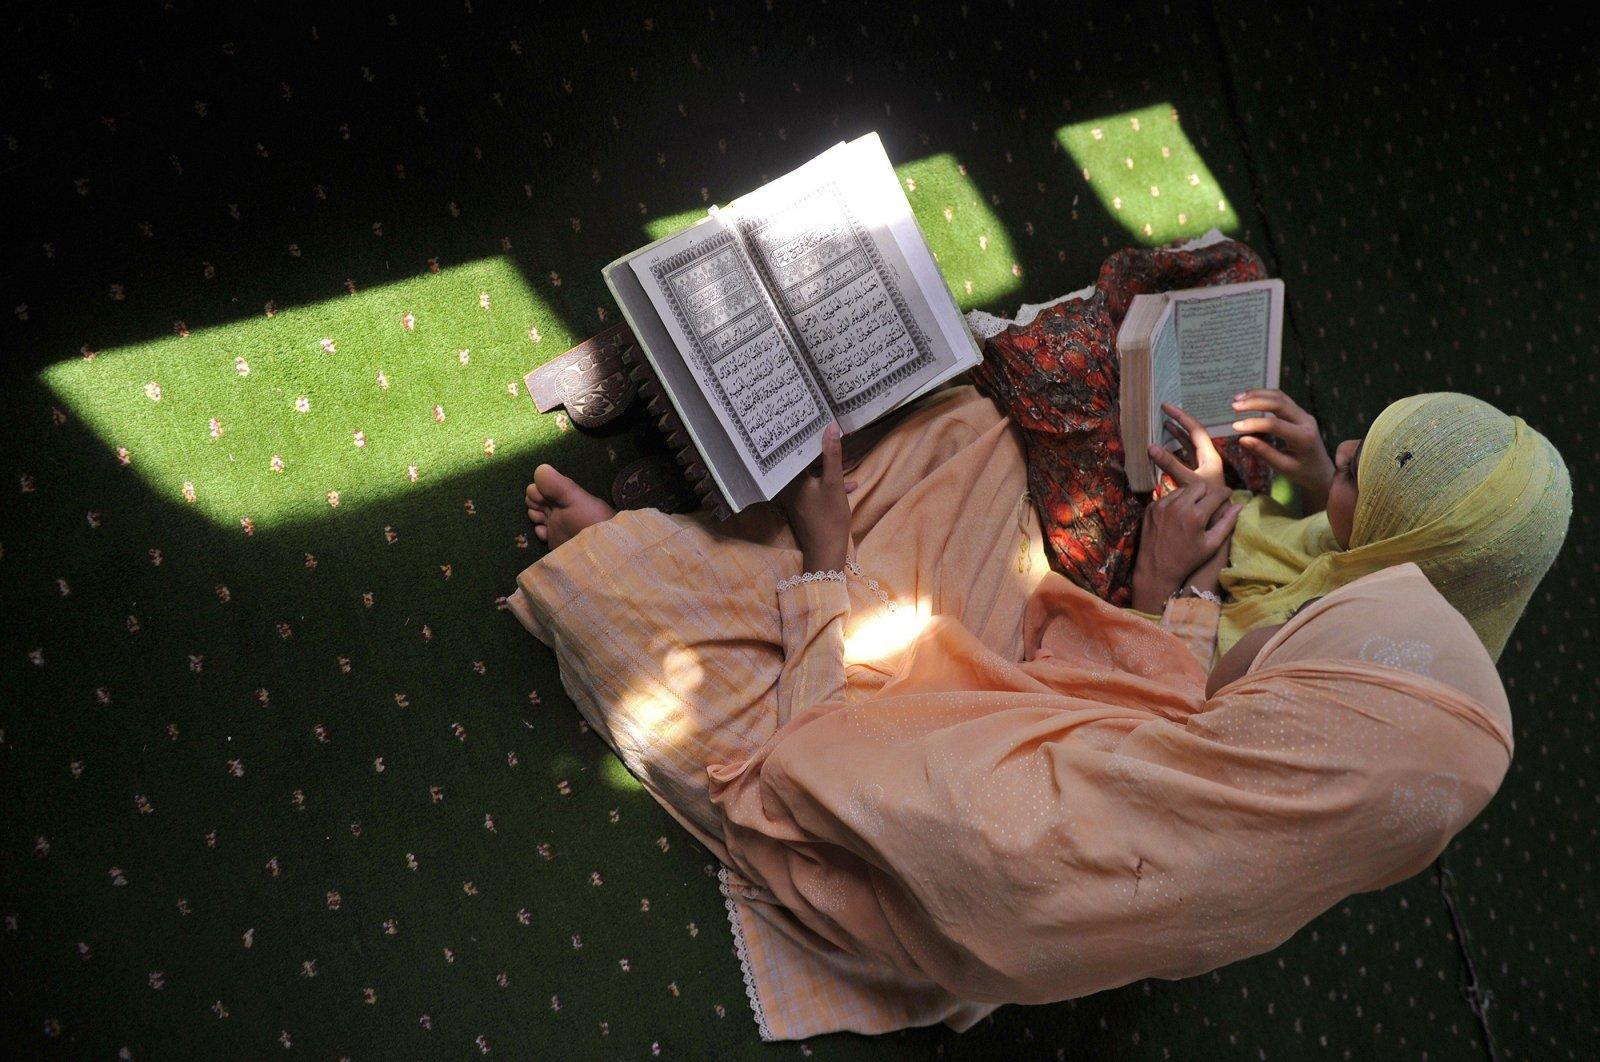 Two Kashmiri Muslim women read the Quran at the Shahi Hamdan shrine on the first Friday of Ramadan in Srinagar, Kashmir, India, Aug. 5, 2011. (AFP Photo)